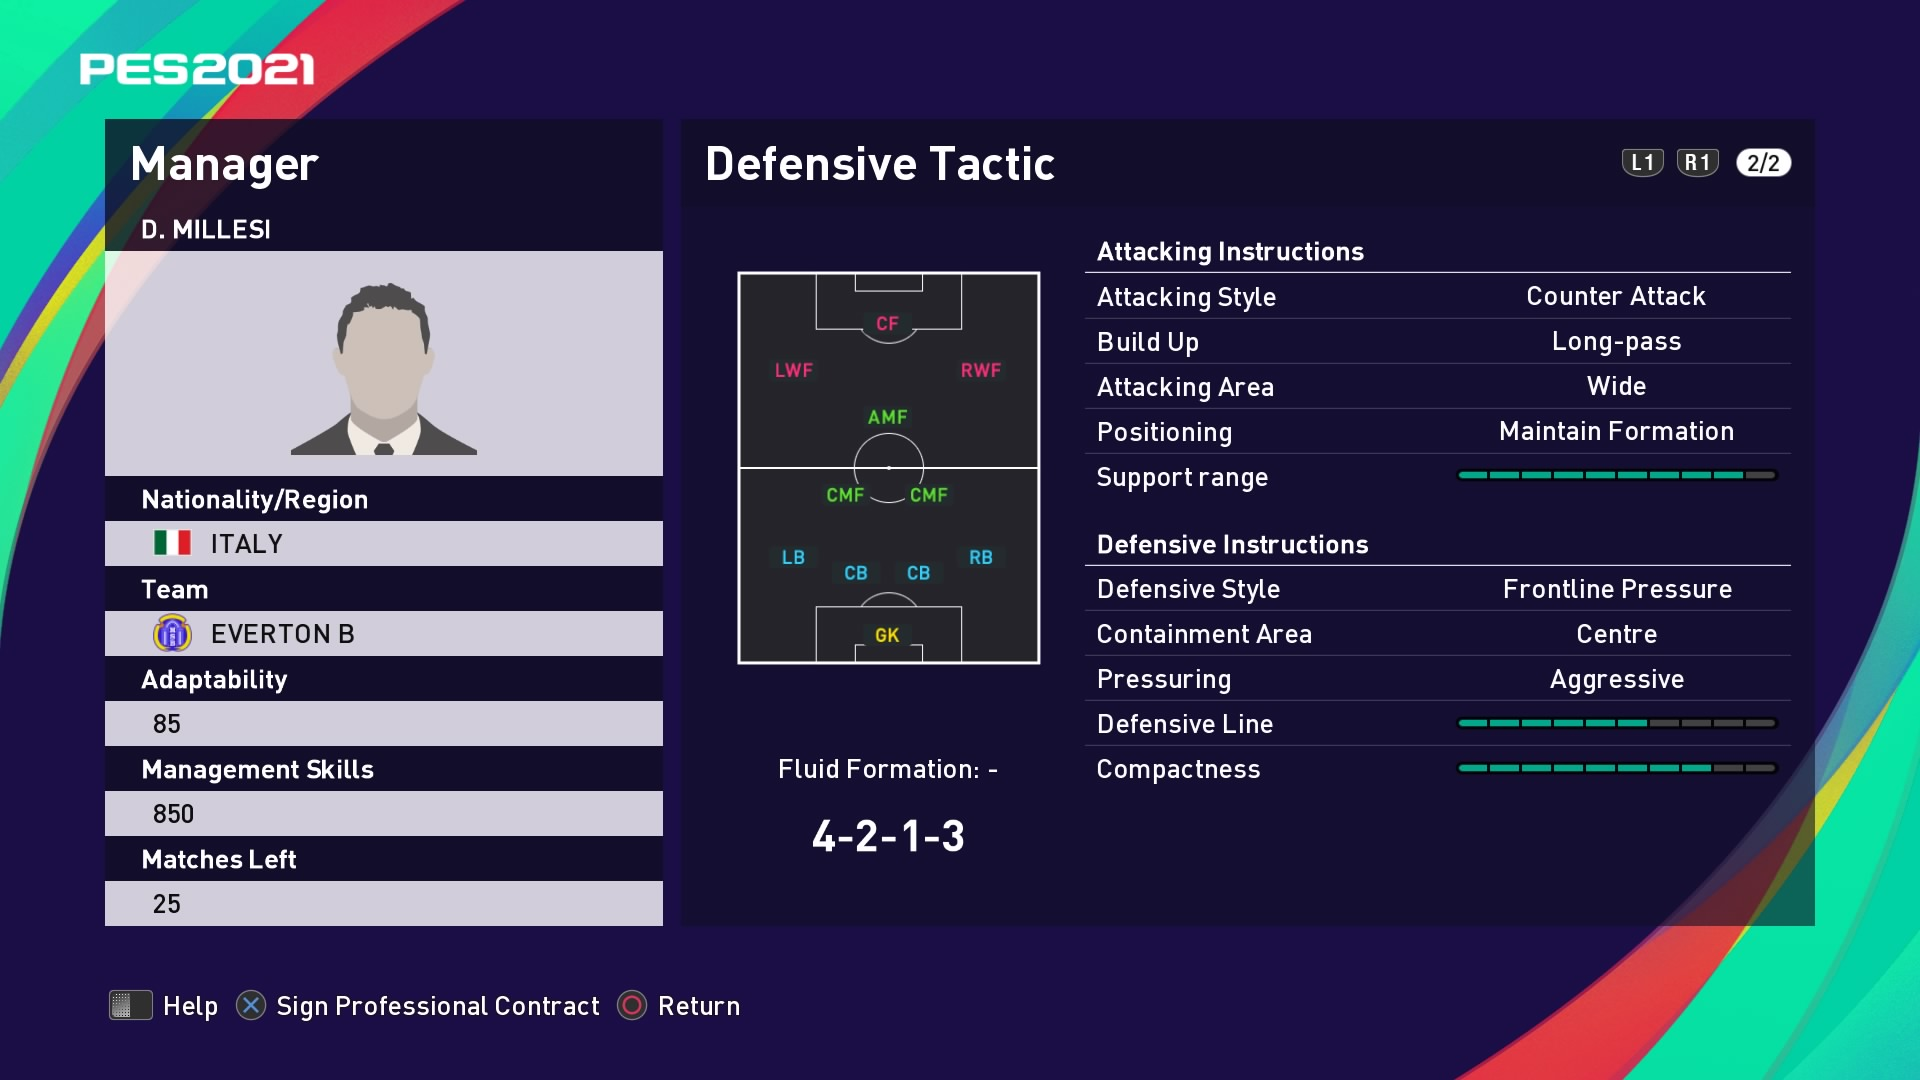 D. Millesi (Carlo Ancelotti) Defensive Tactic in PES 2021 myClub